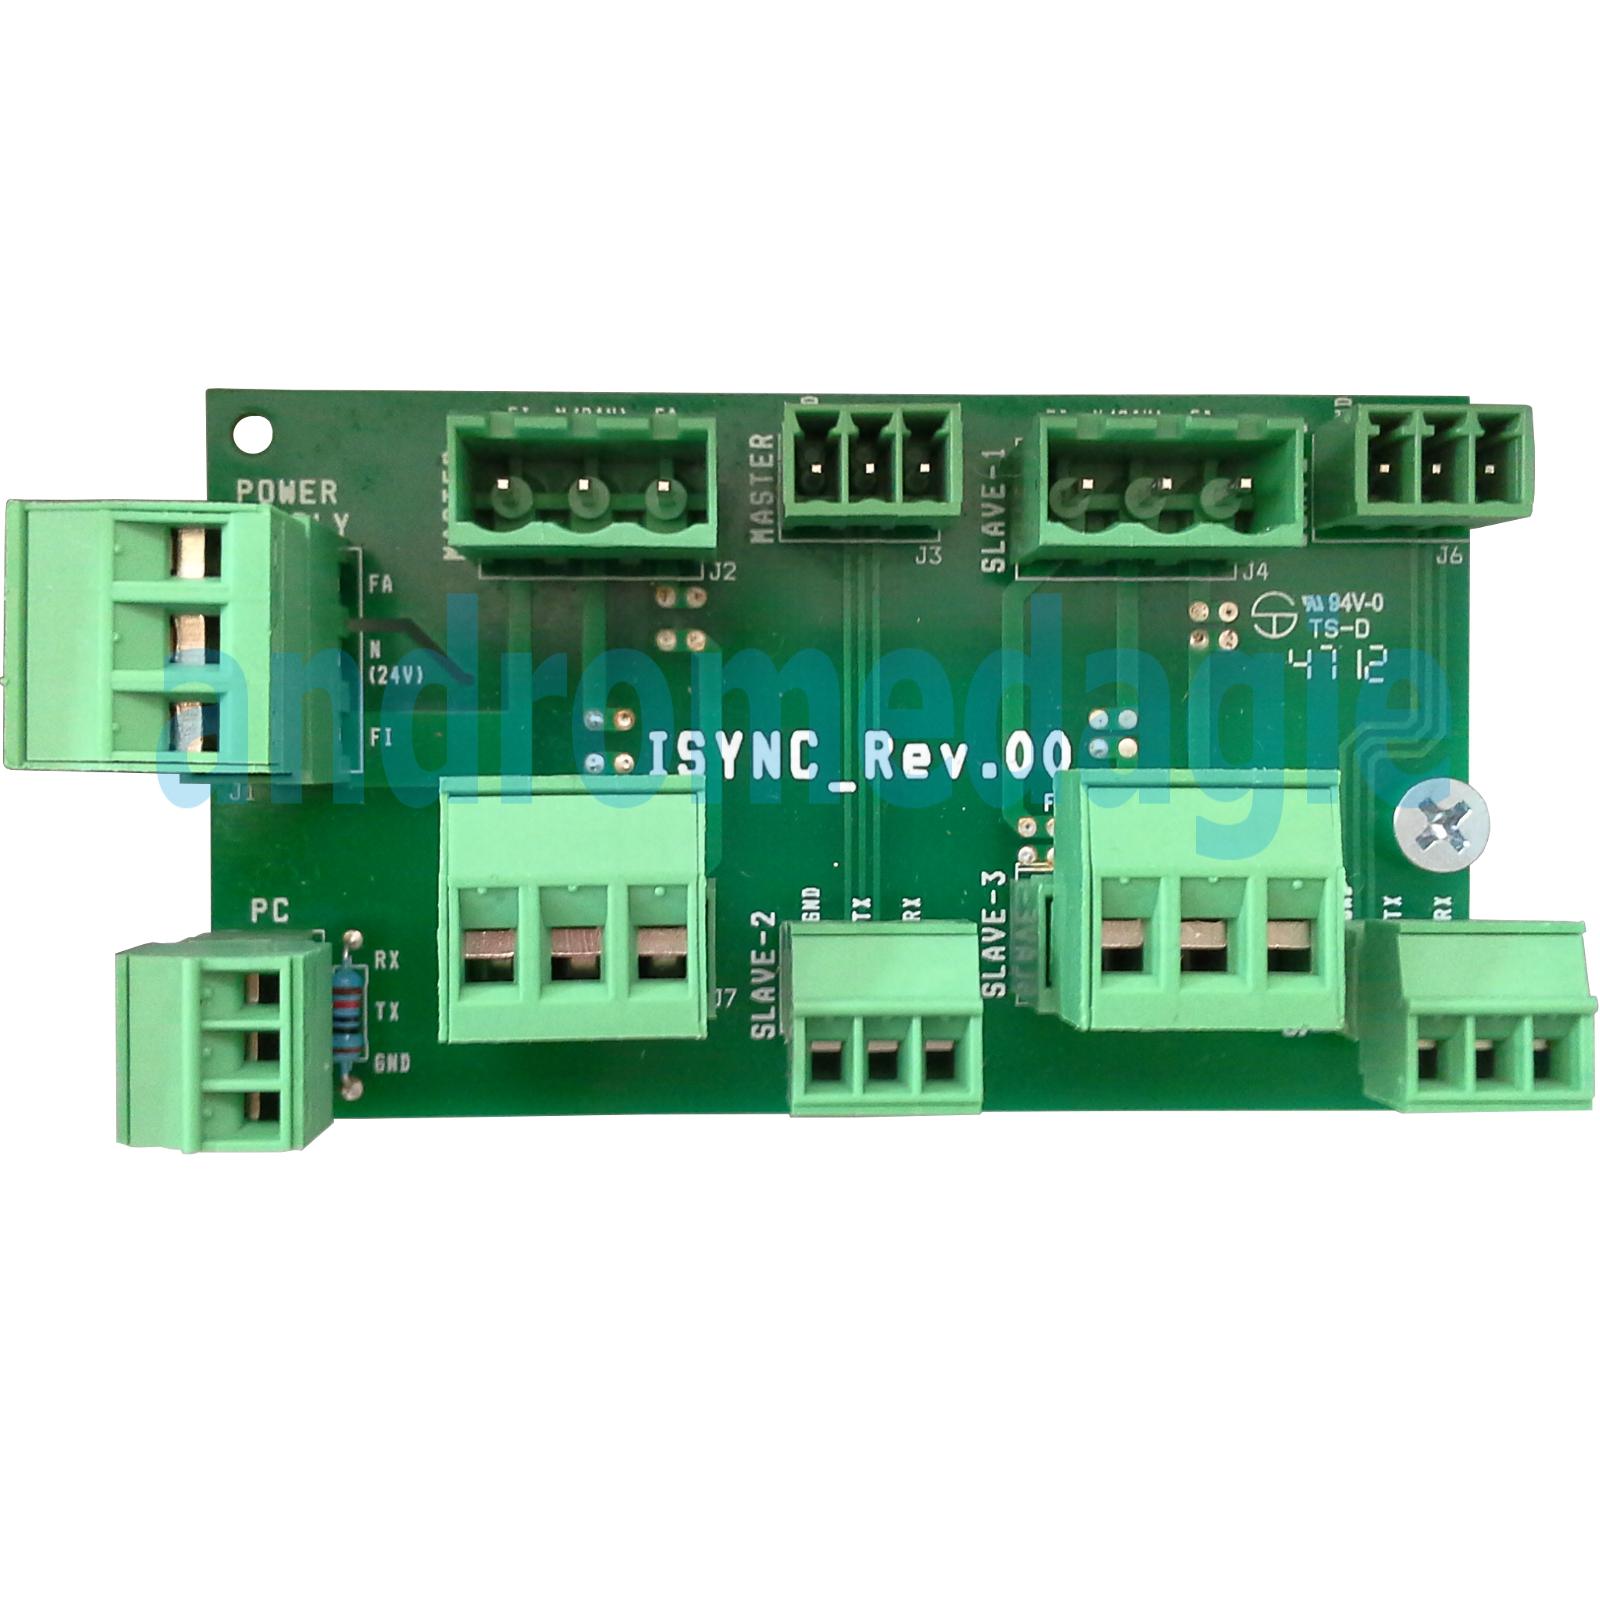 SKYLIWINR350HB2WNET-SIMPLE/R1V KIT PER LUCERNAIO ANTA MAX 140 KG